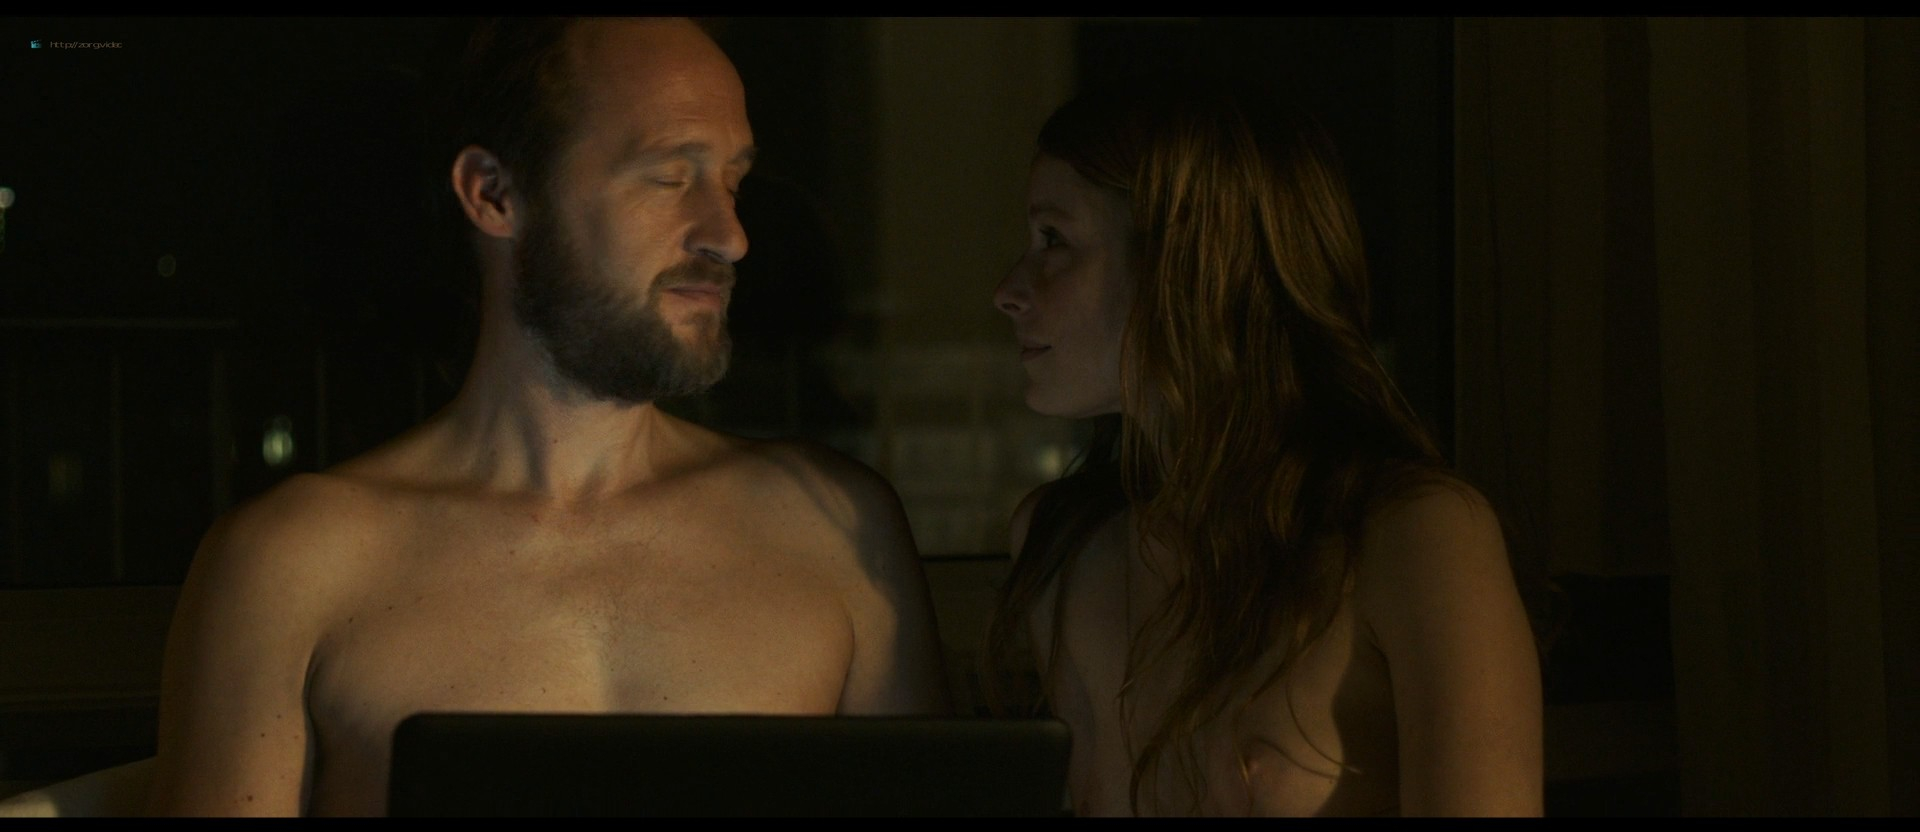 Odine Johne nude full frontal and sex Sonja Baum nude - Agnes (DE-2016) HD 1080p BluRay (13)